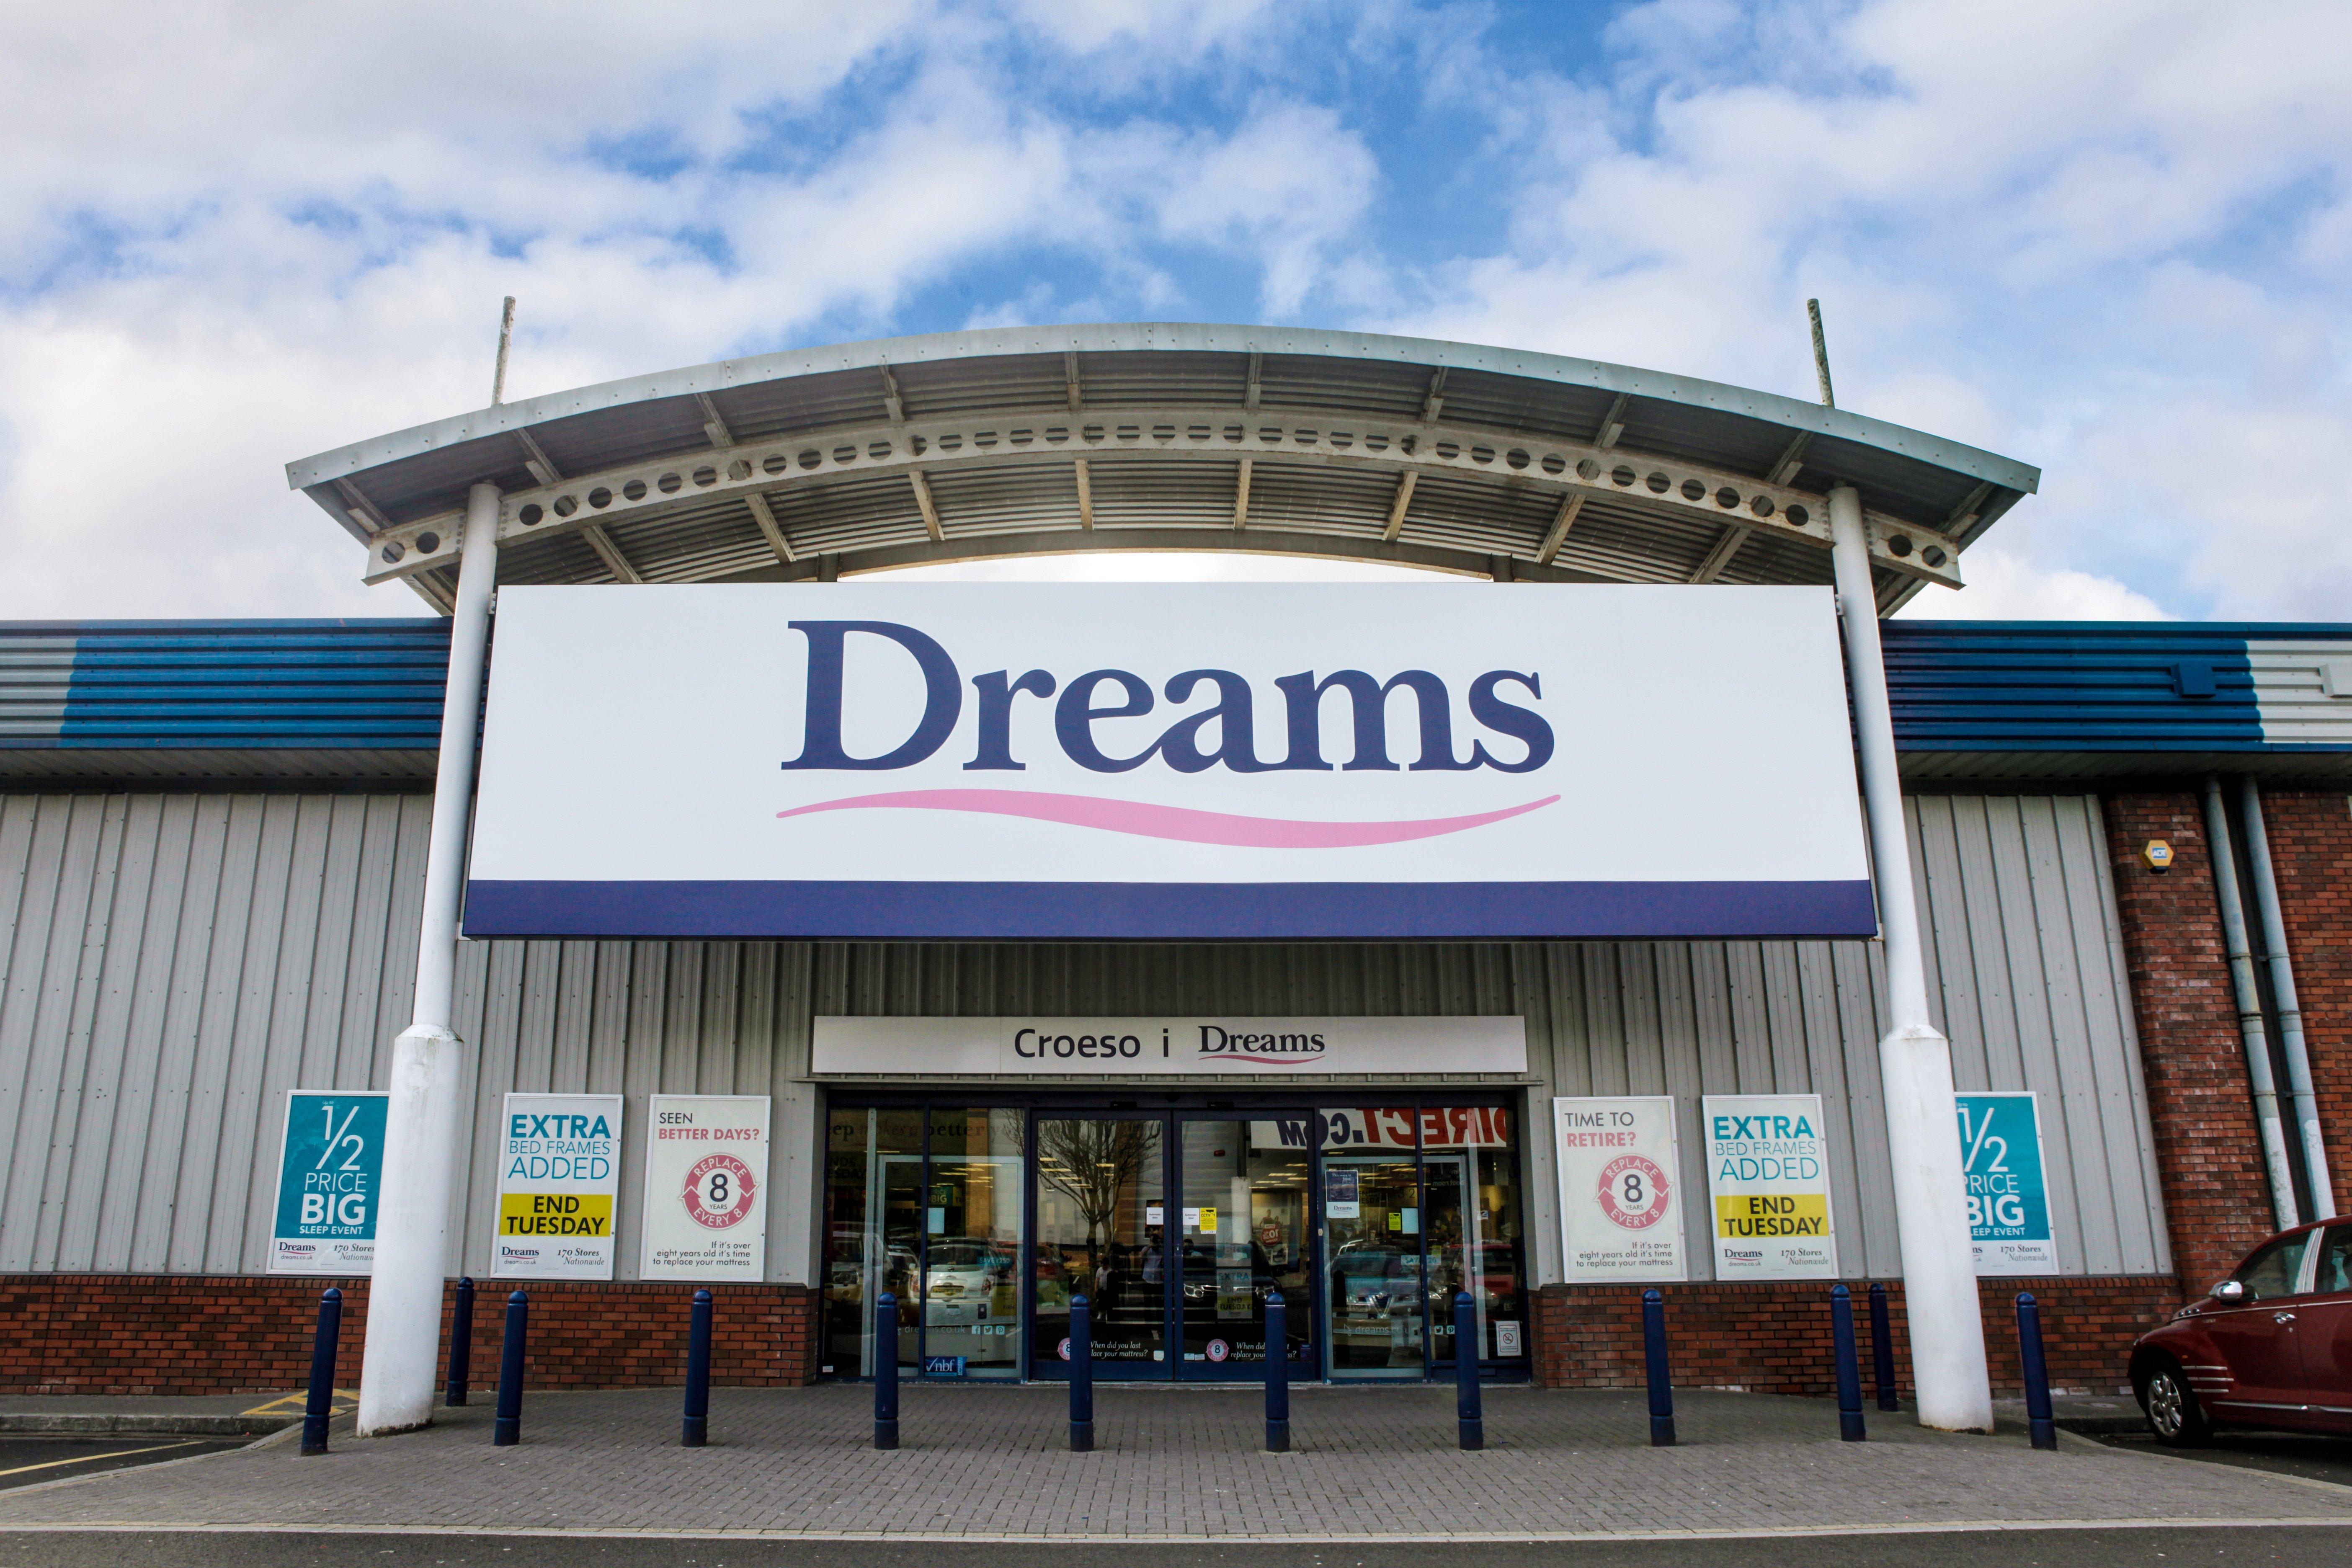 dreams store in merthyr tydfil - beds, mattresses